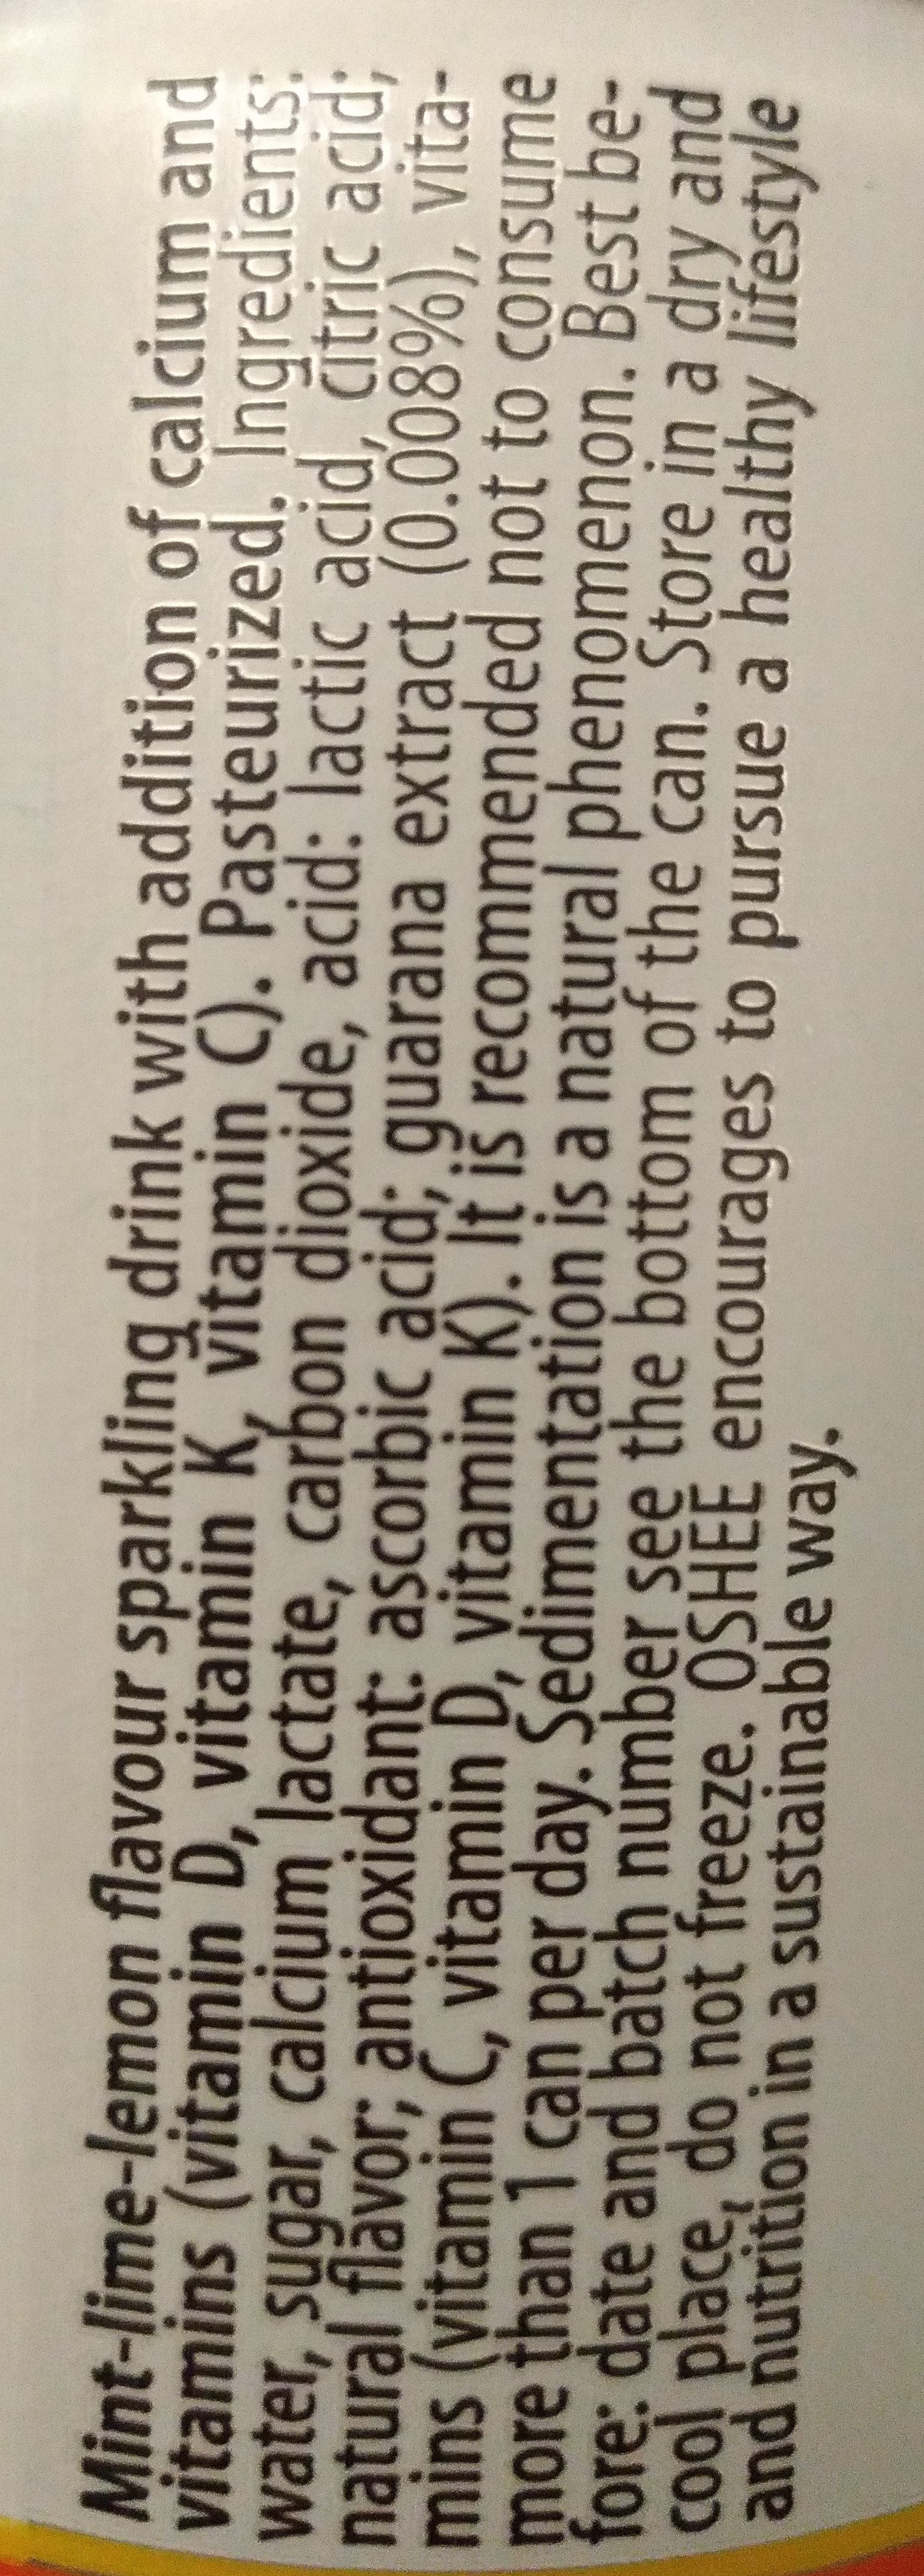 Oshee vitamin - Składniki - en